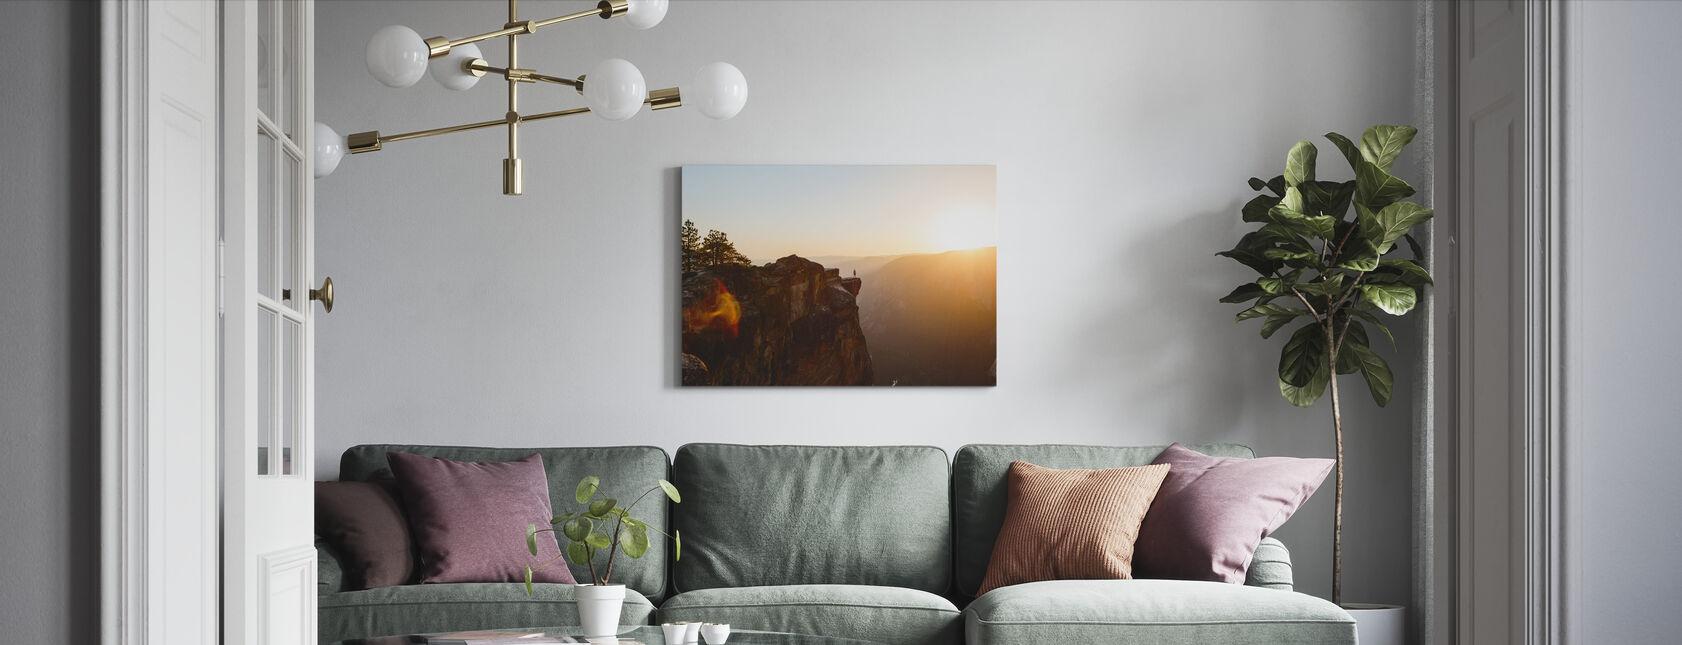 Taft Point, Nationaal Park Yosemite - Canvas print - Woonkamer